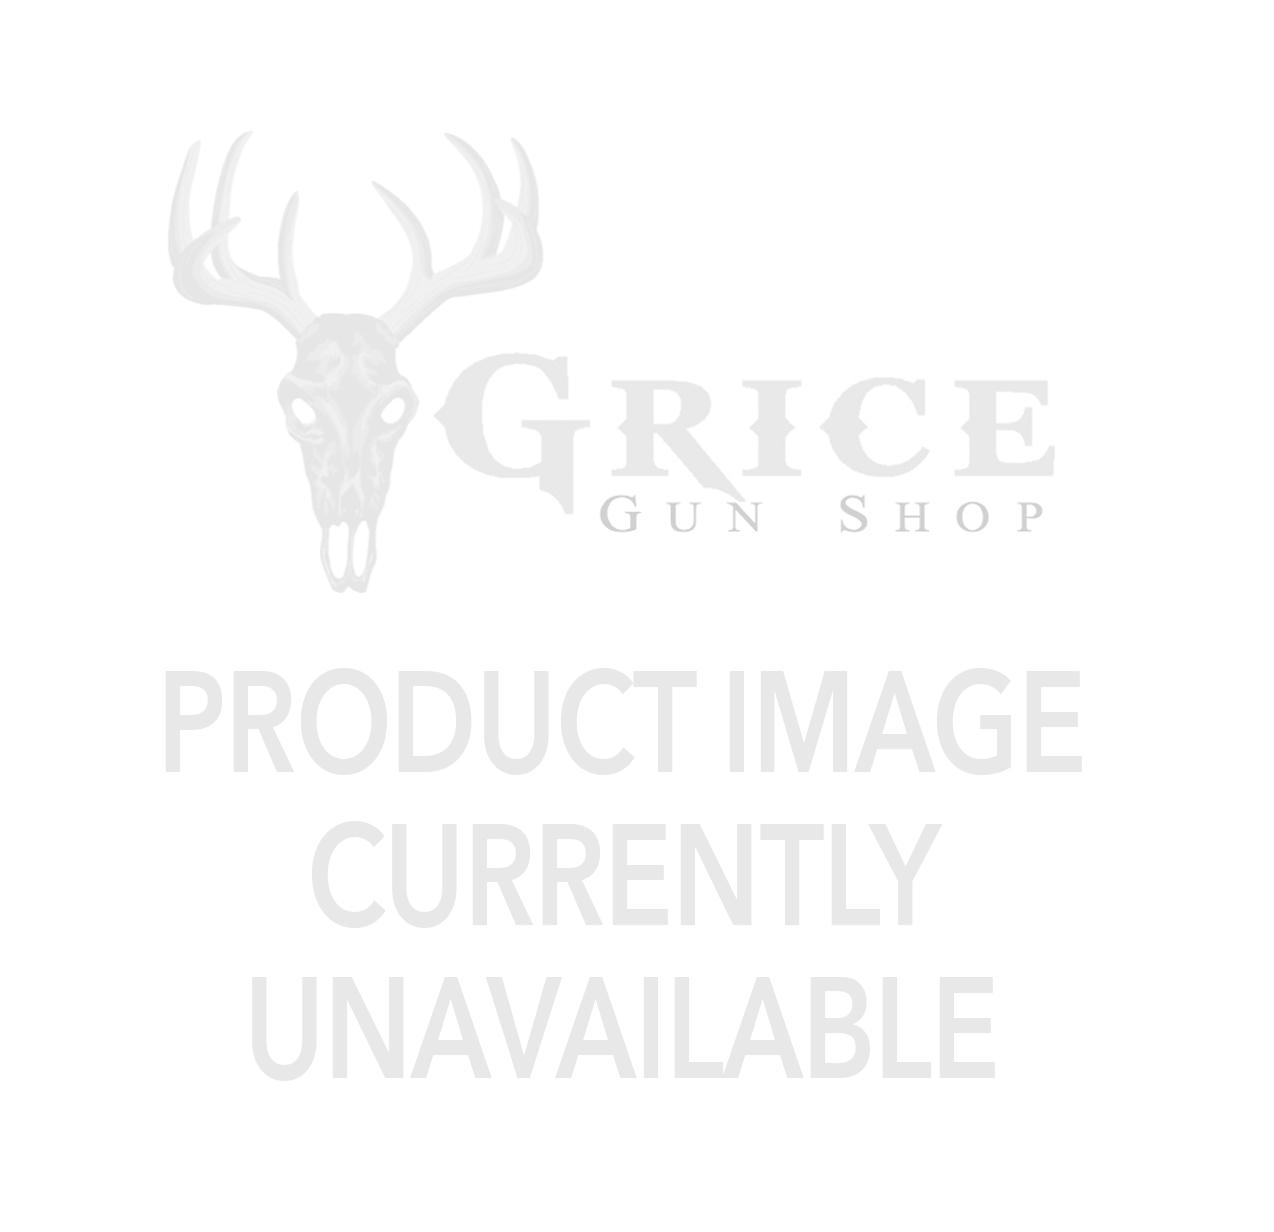 Simmons - ProHunter 1.5-5x32mm ProDiamond Reticle